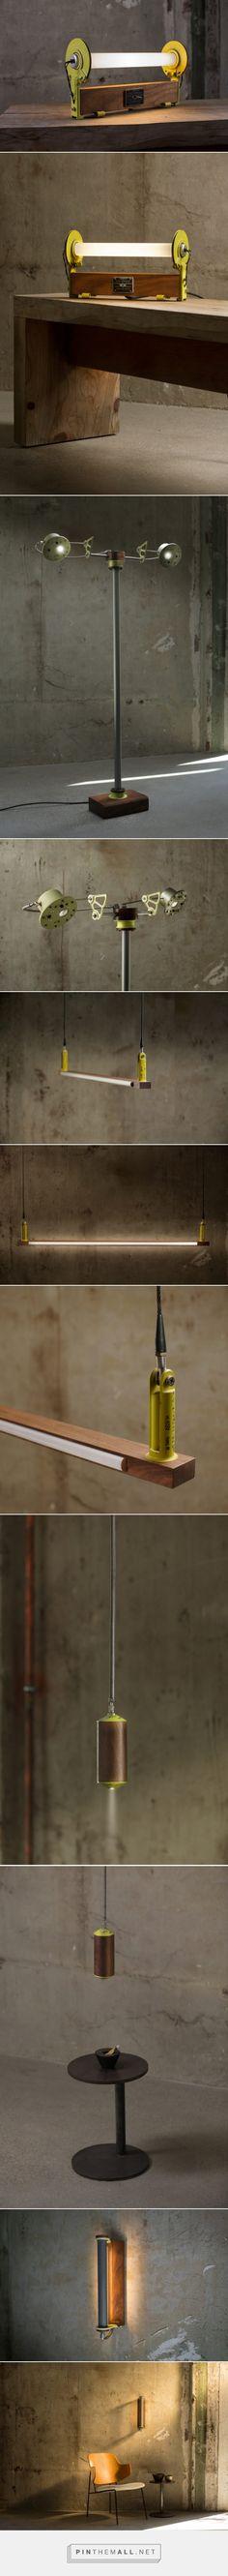 Lighting Made with Aluminum Aerospace Parts and Wood by Alper Nakri - Design Milk - created via https://pinthemall.net